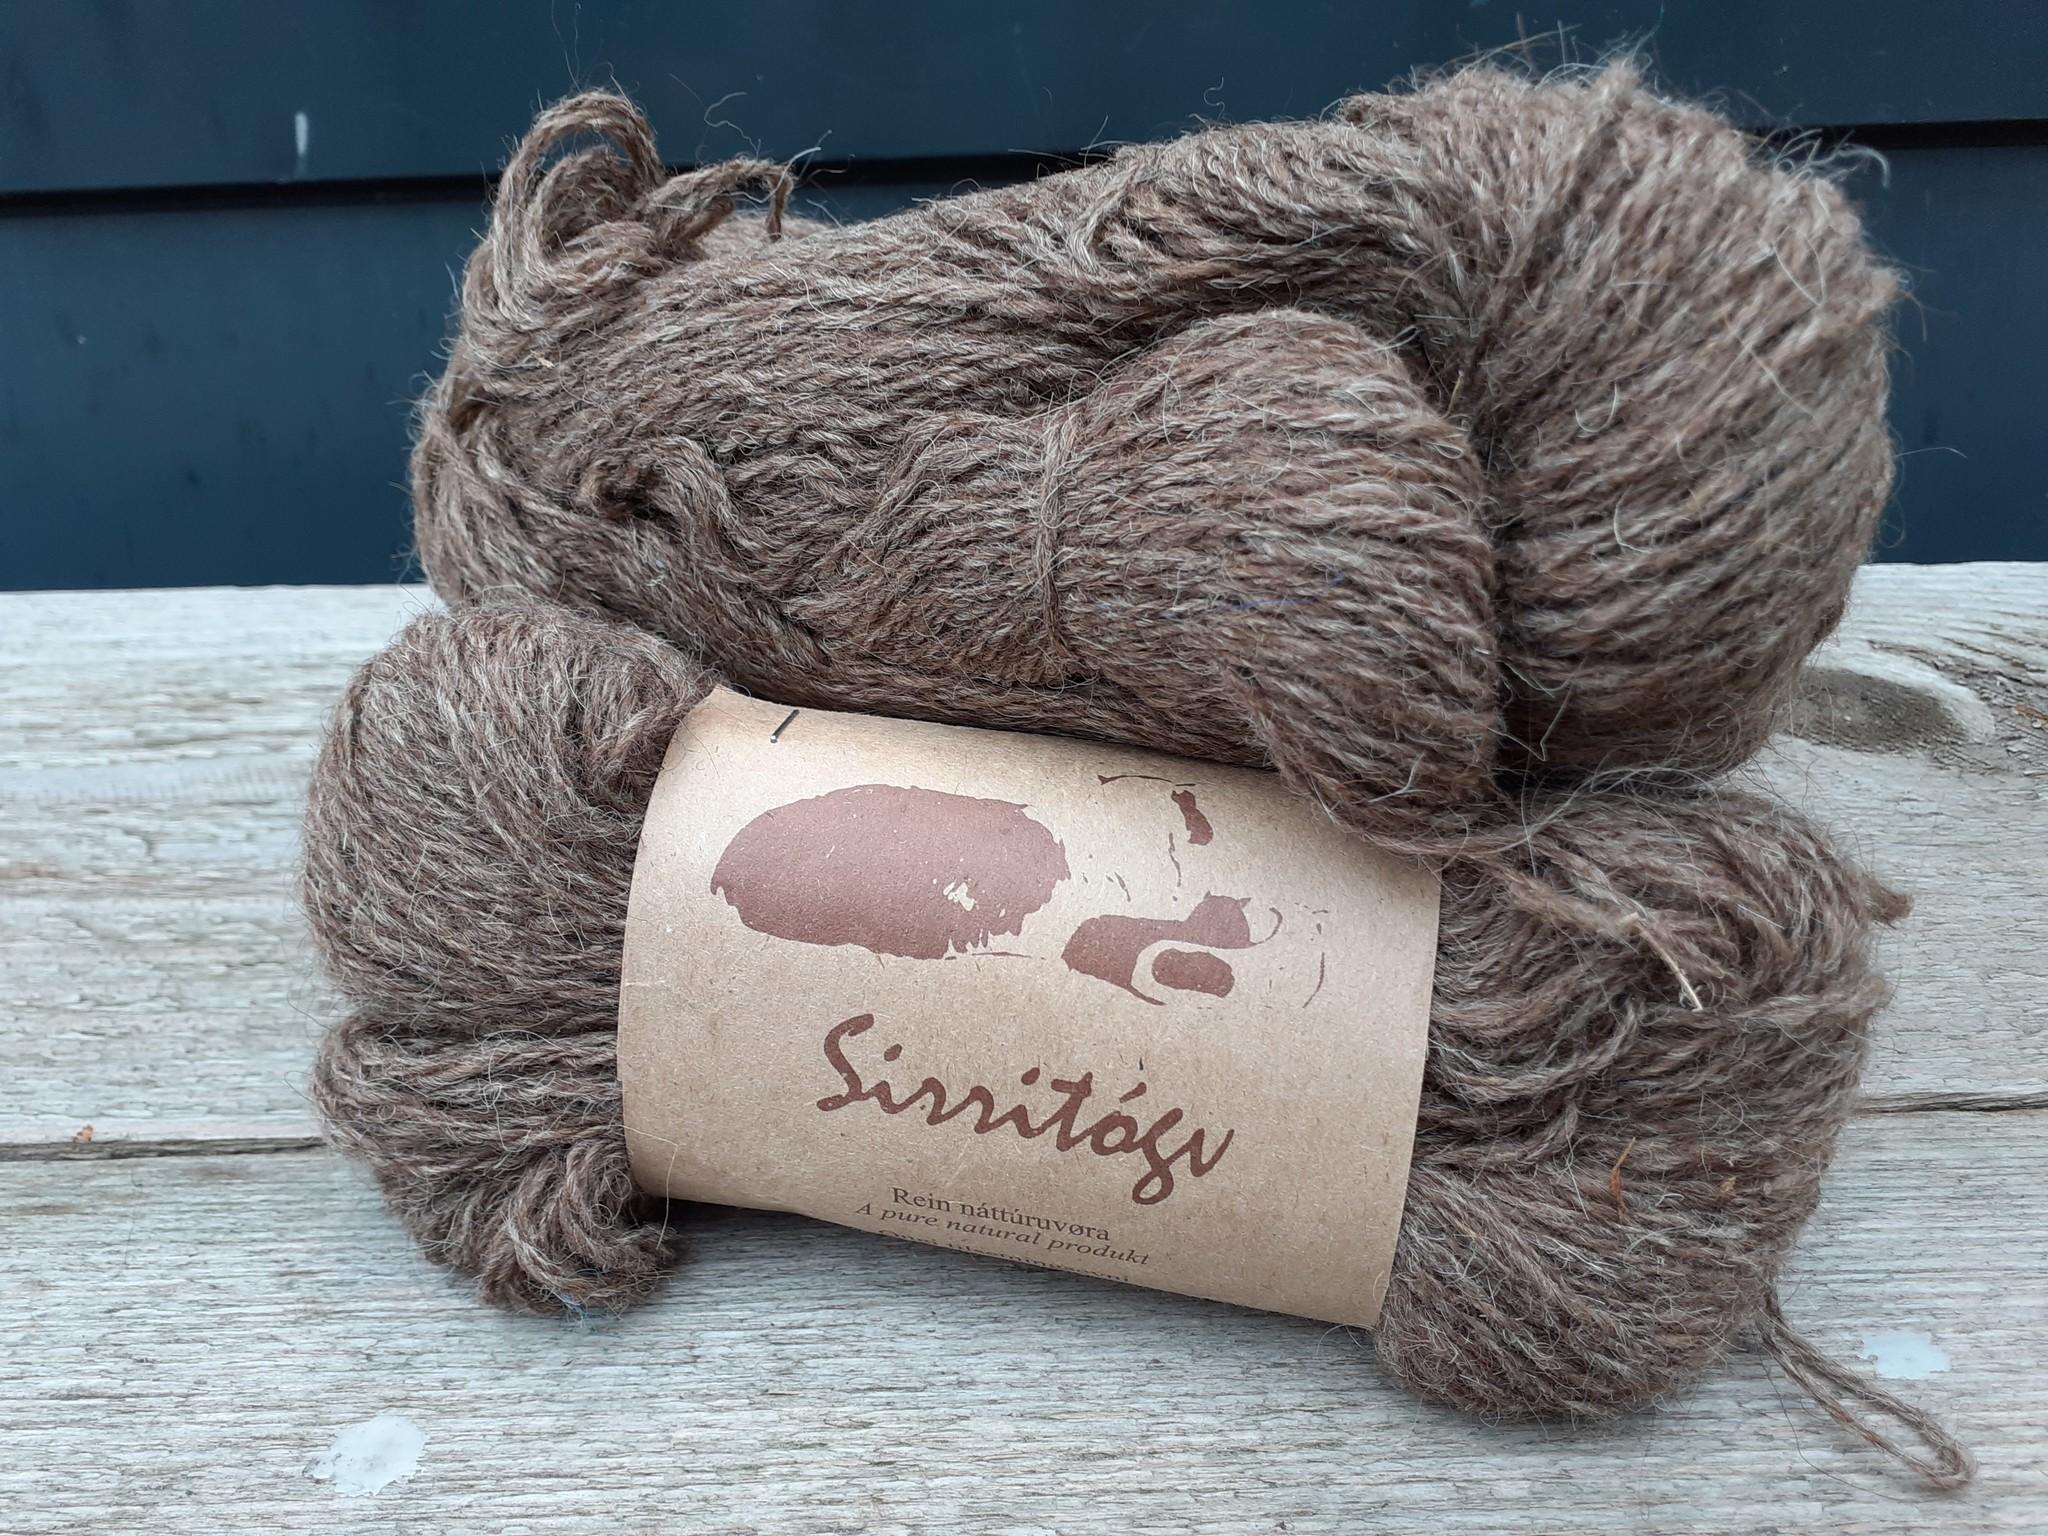 Sirritógv Sirritógv - 31 - brown